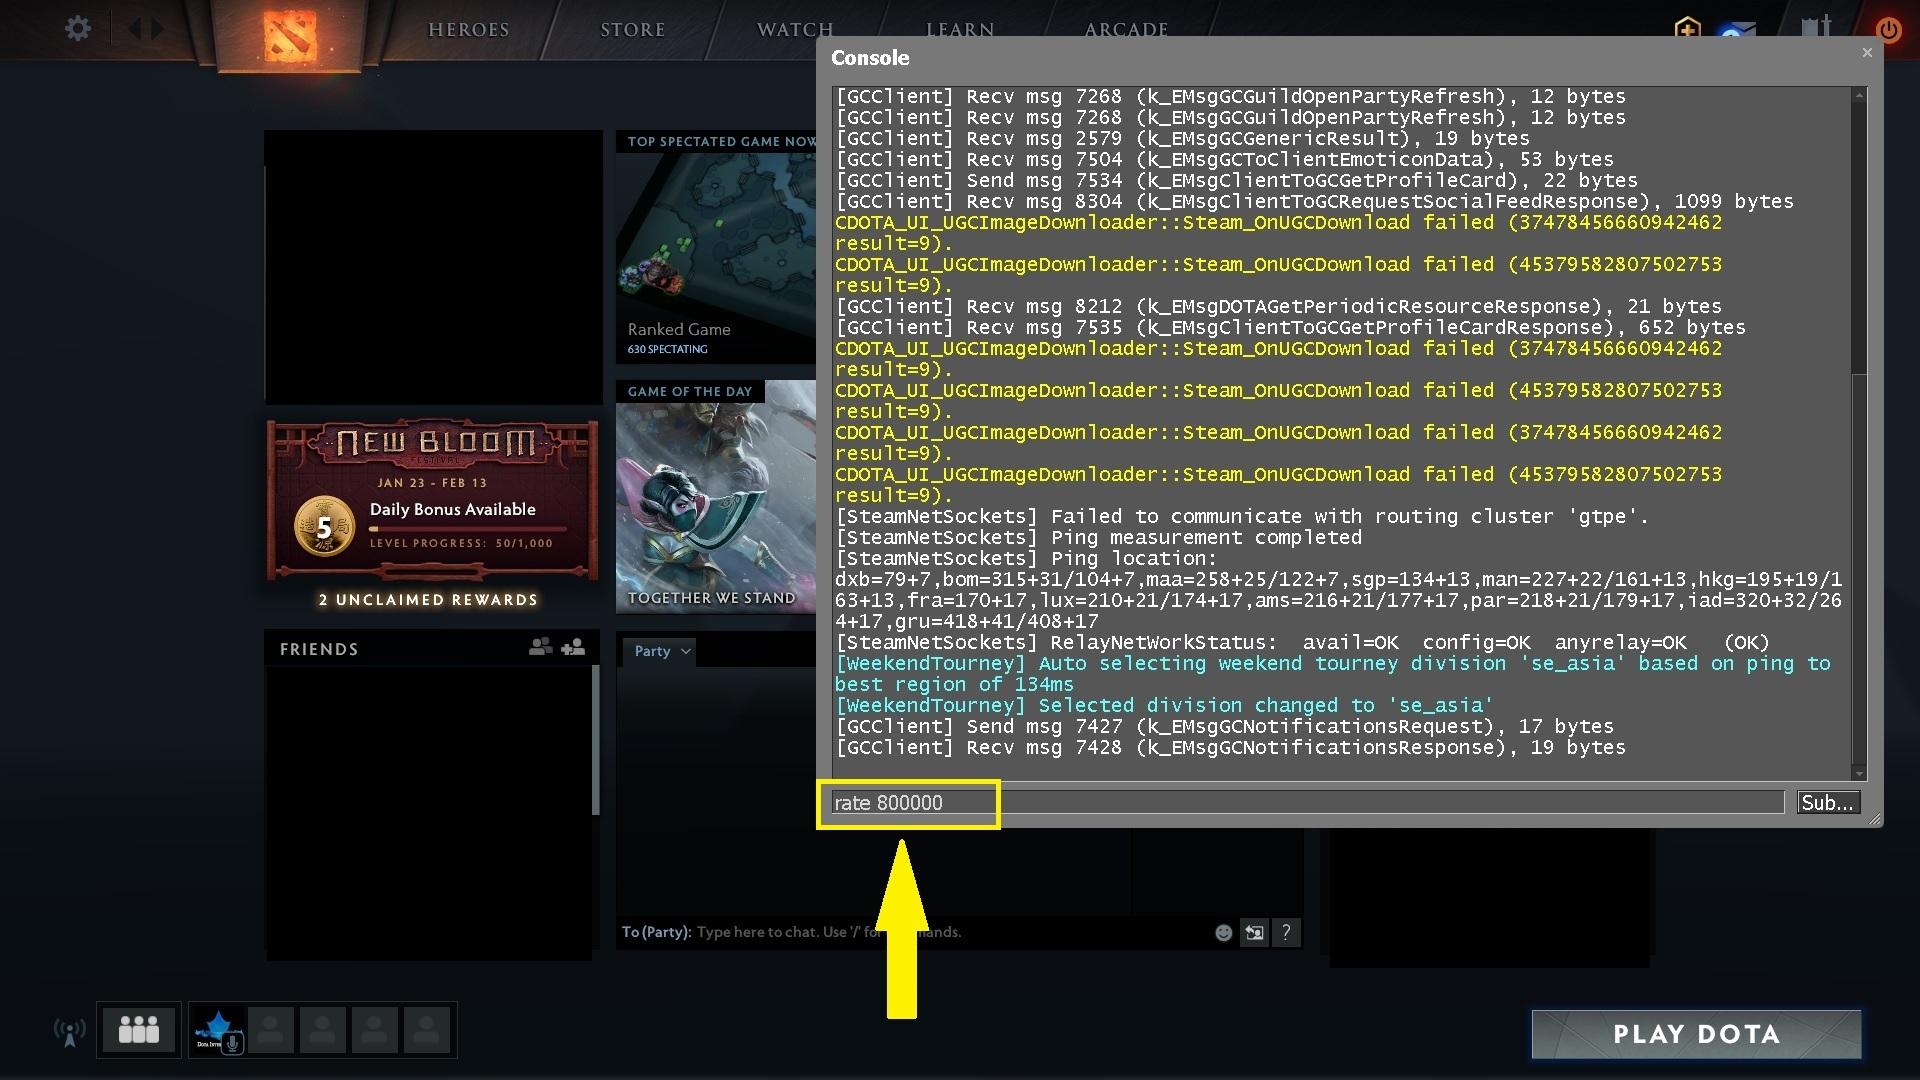 Dota 2 console command